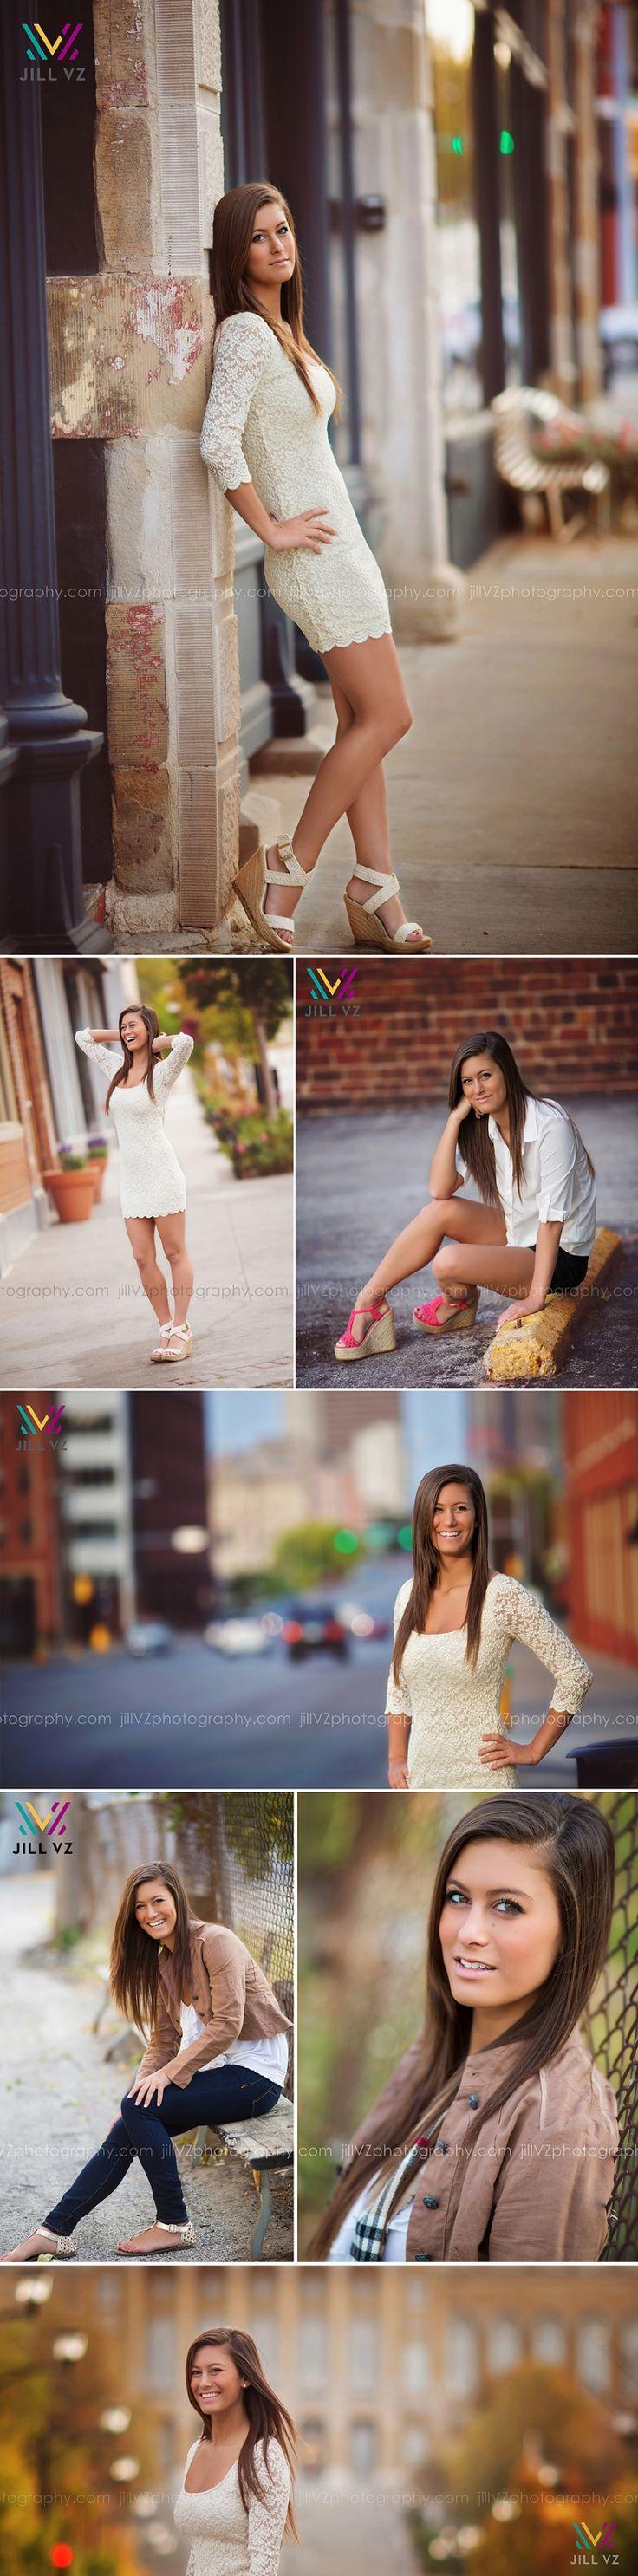 Paige | 2013 Senior | Johnston High School » Jill VZ Photography